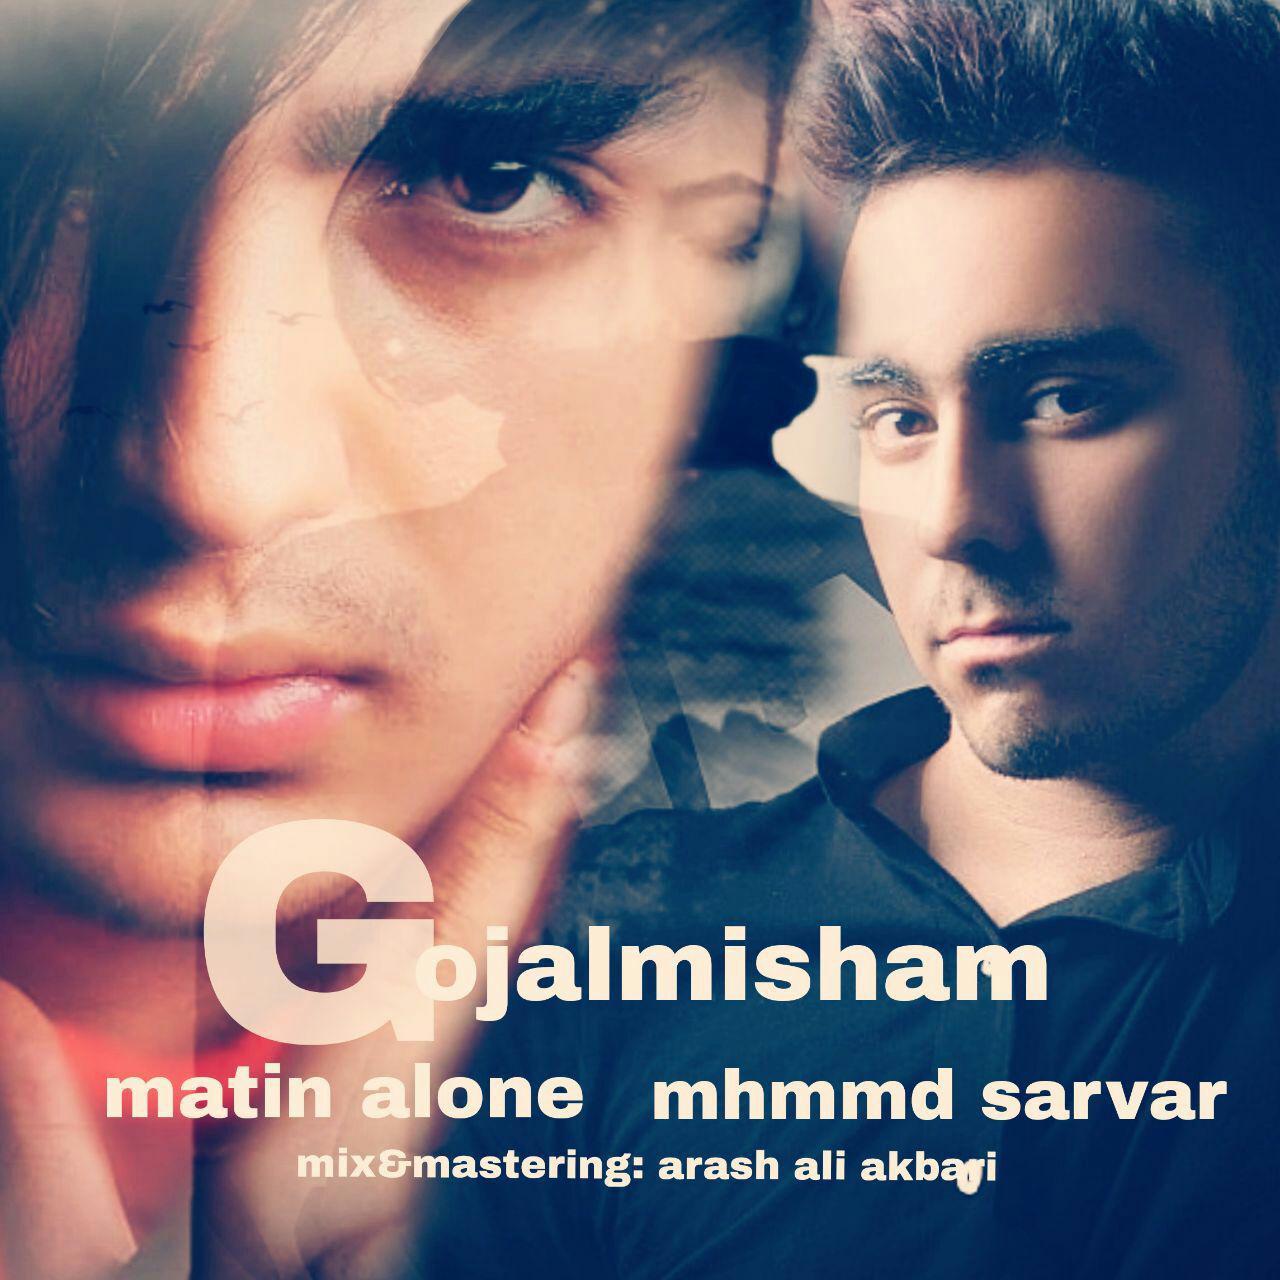 http://s8.picofile.com/file/8340084818/17Matin_Alone_Ft_Mohammad_Sarvar_Gojalmisham.jpg